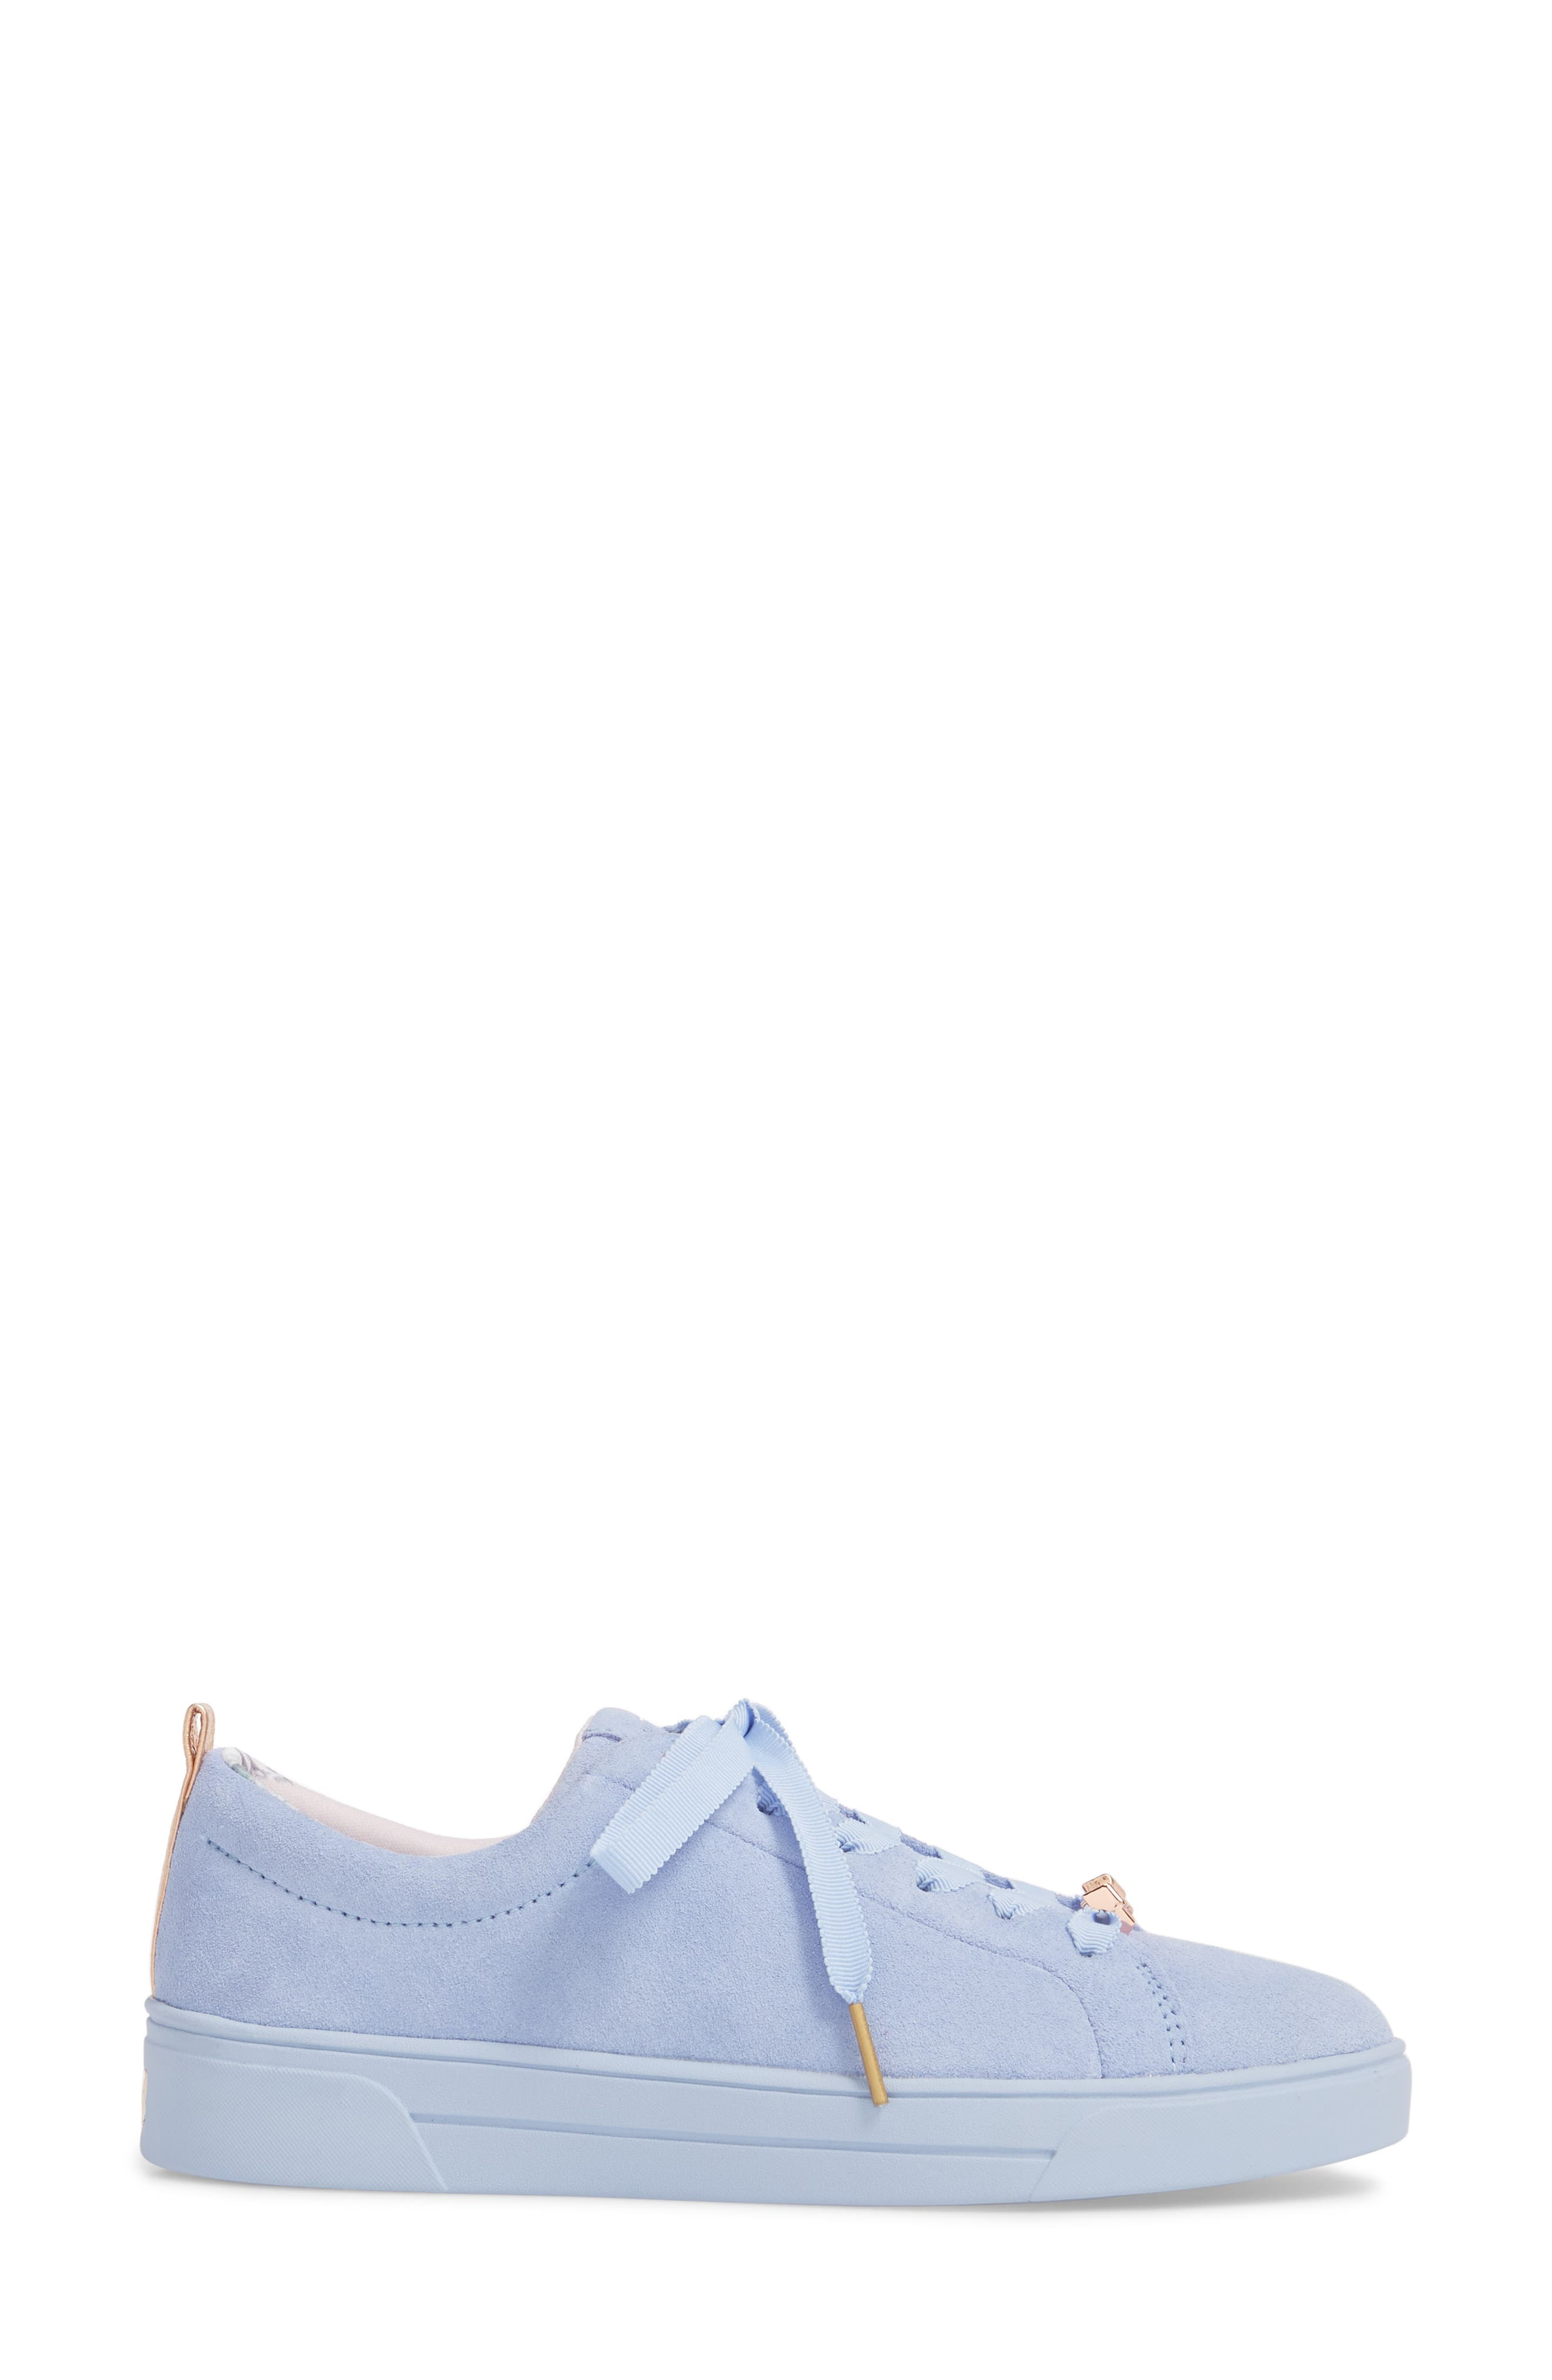 Kelleis Sneaker,                             Alternate thumbnail 3, color,                             Light Blue Suede